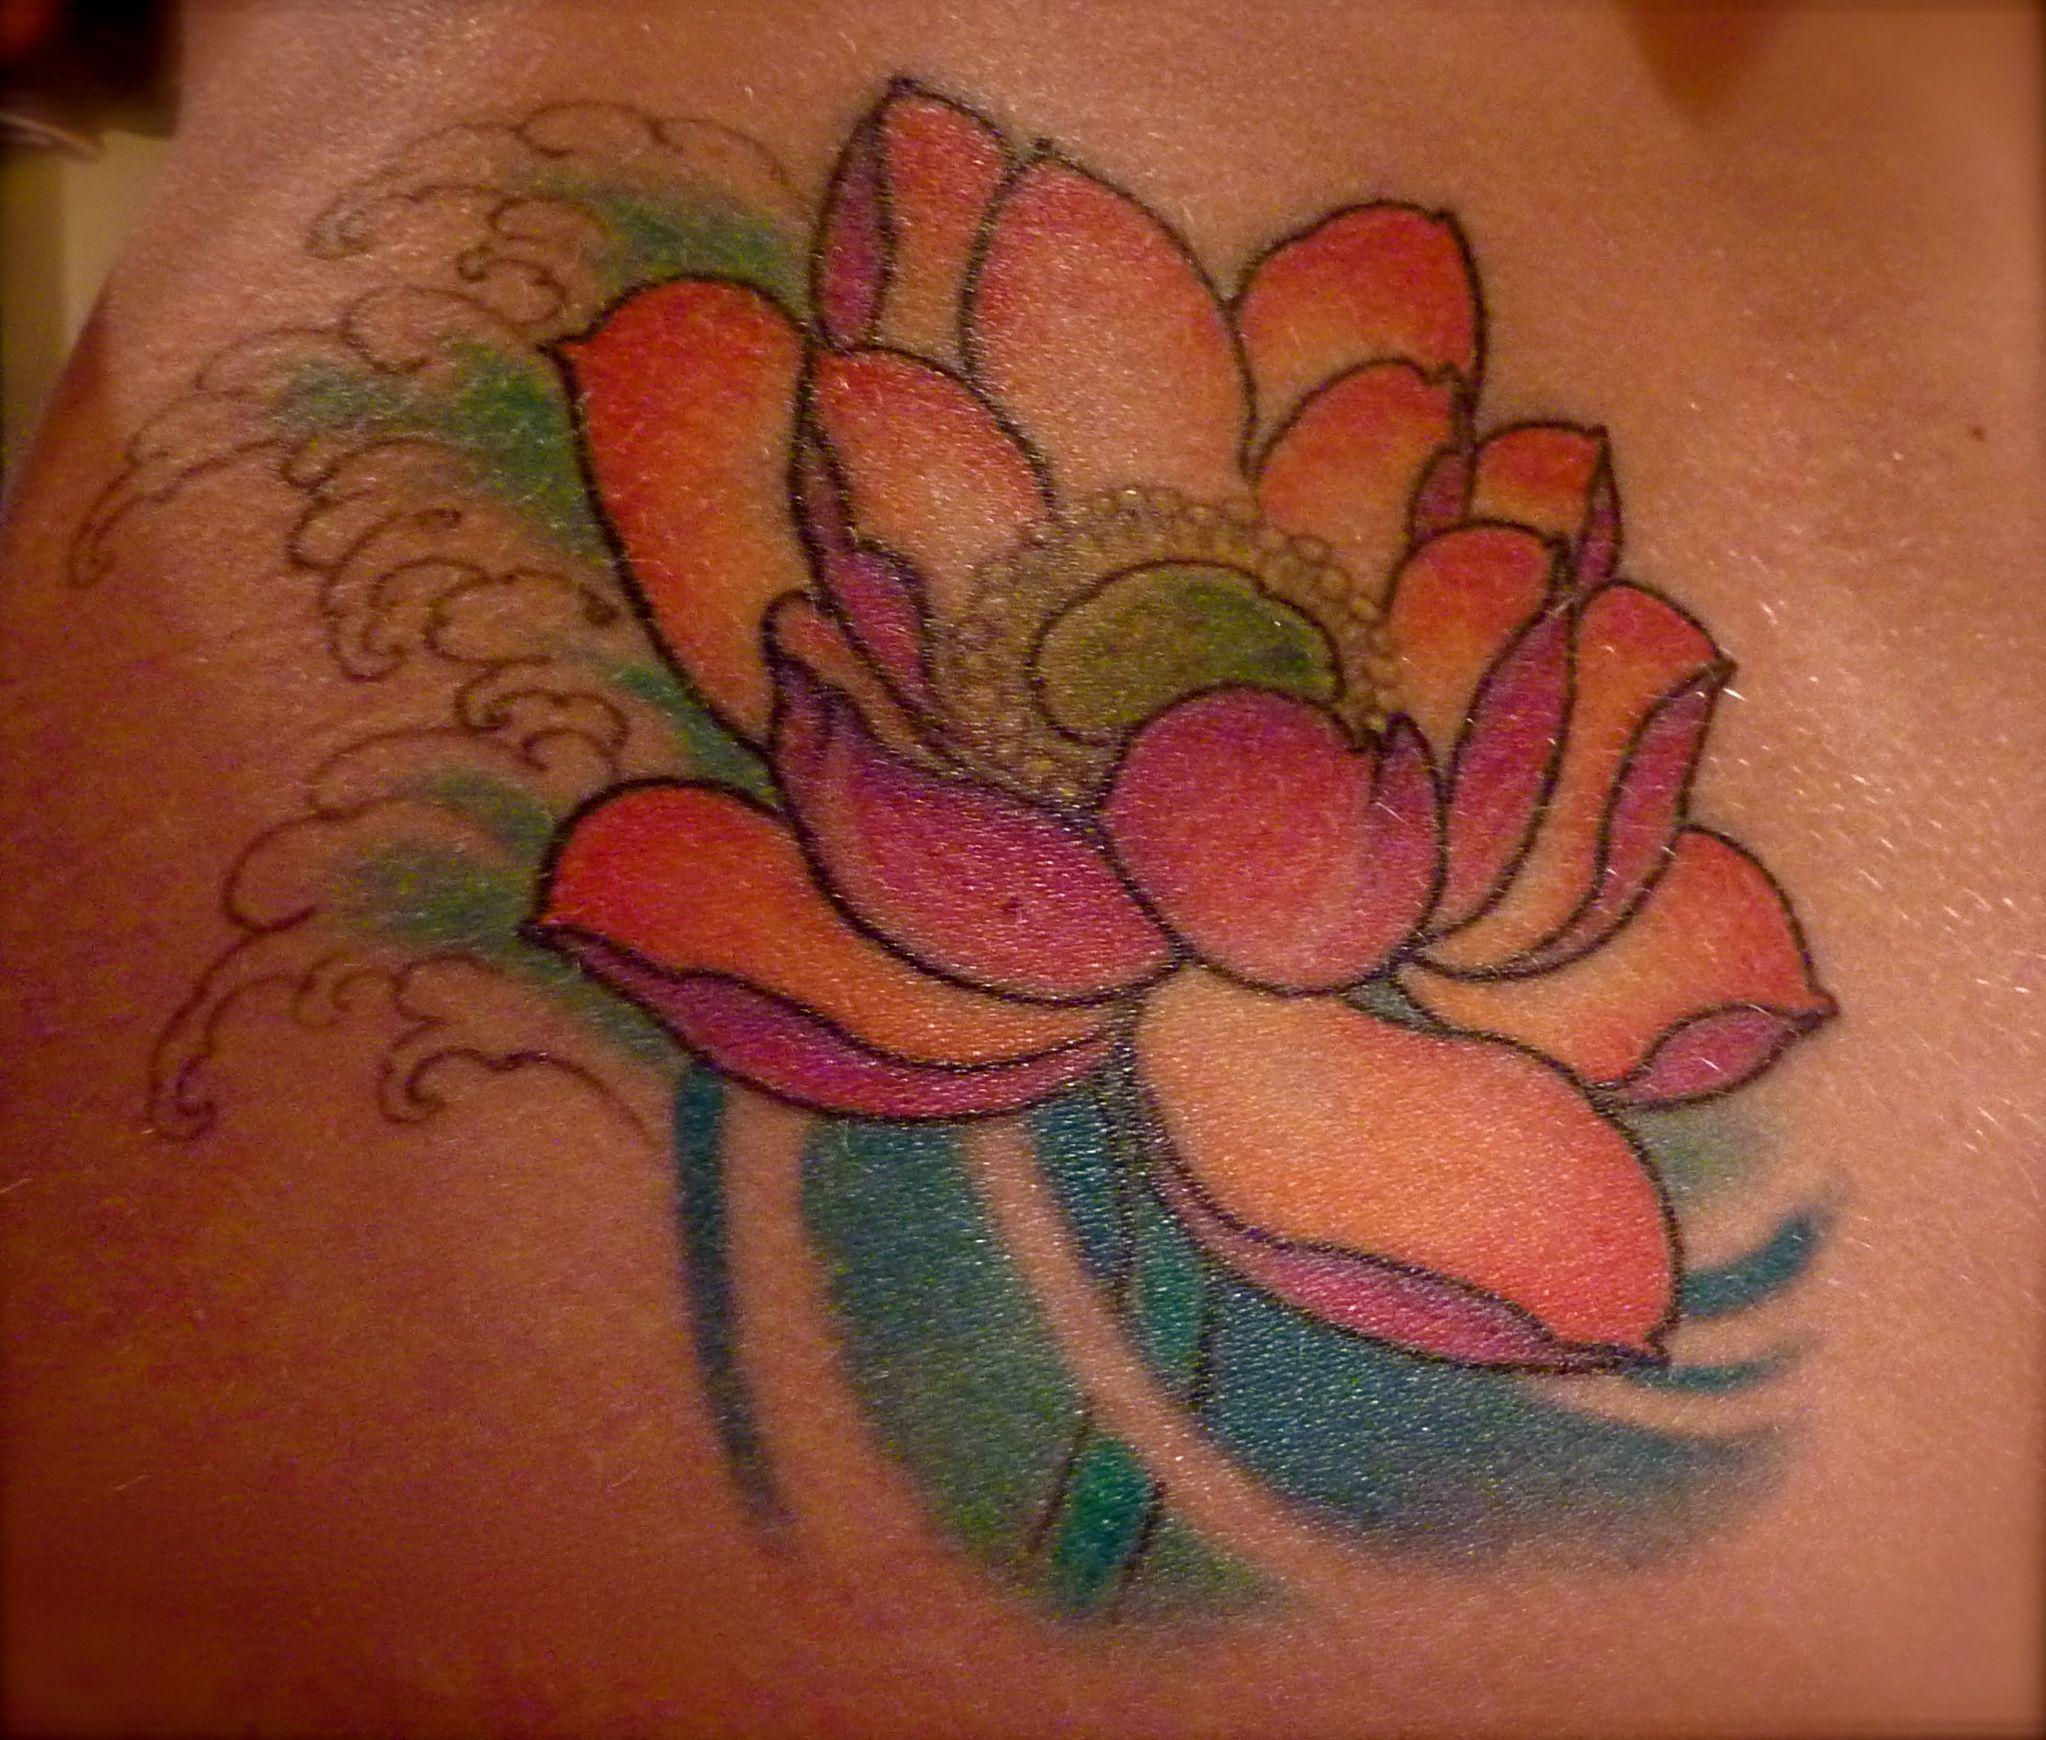 One of my tattoos lotus flower by camila rocha on my left hip one of my tattoos lotus flower by camila rocha on my left hip izmirmasajfo